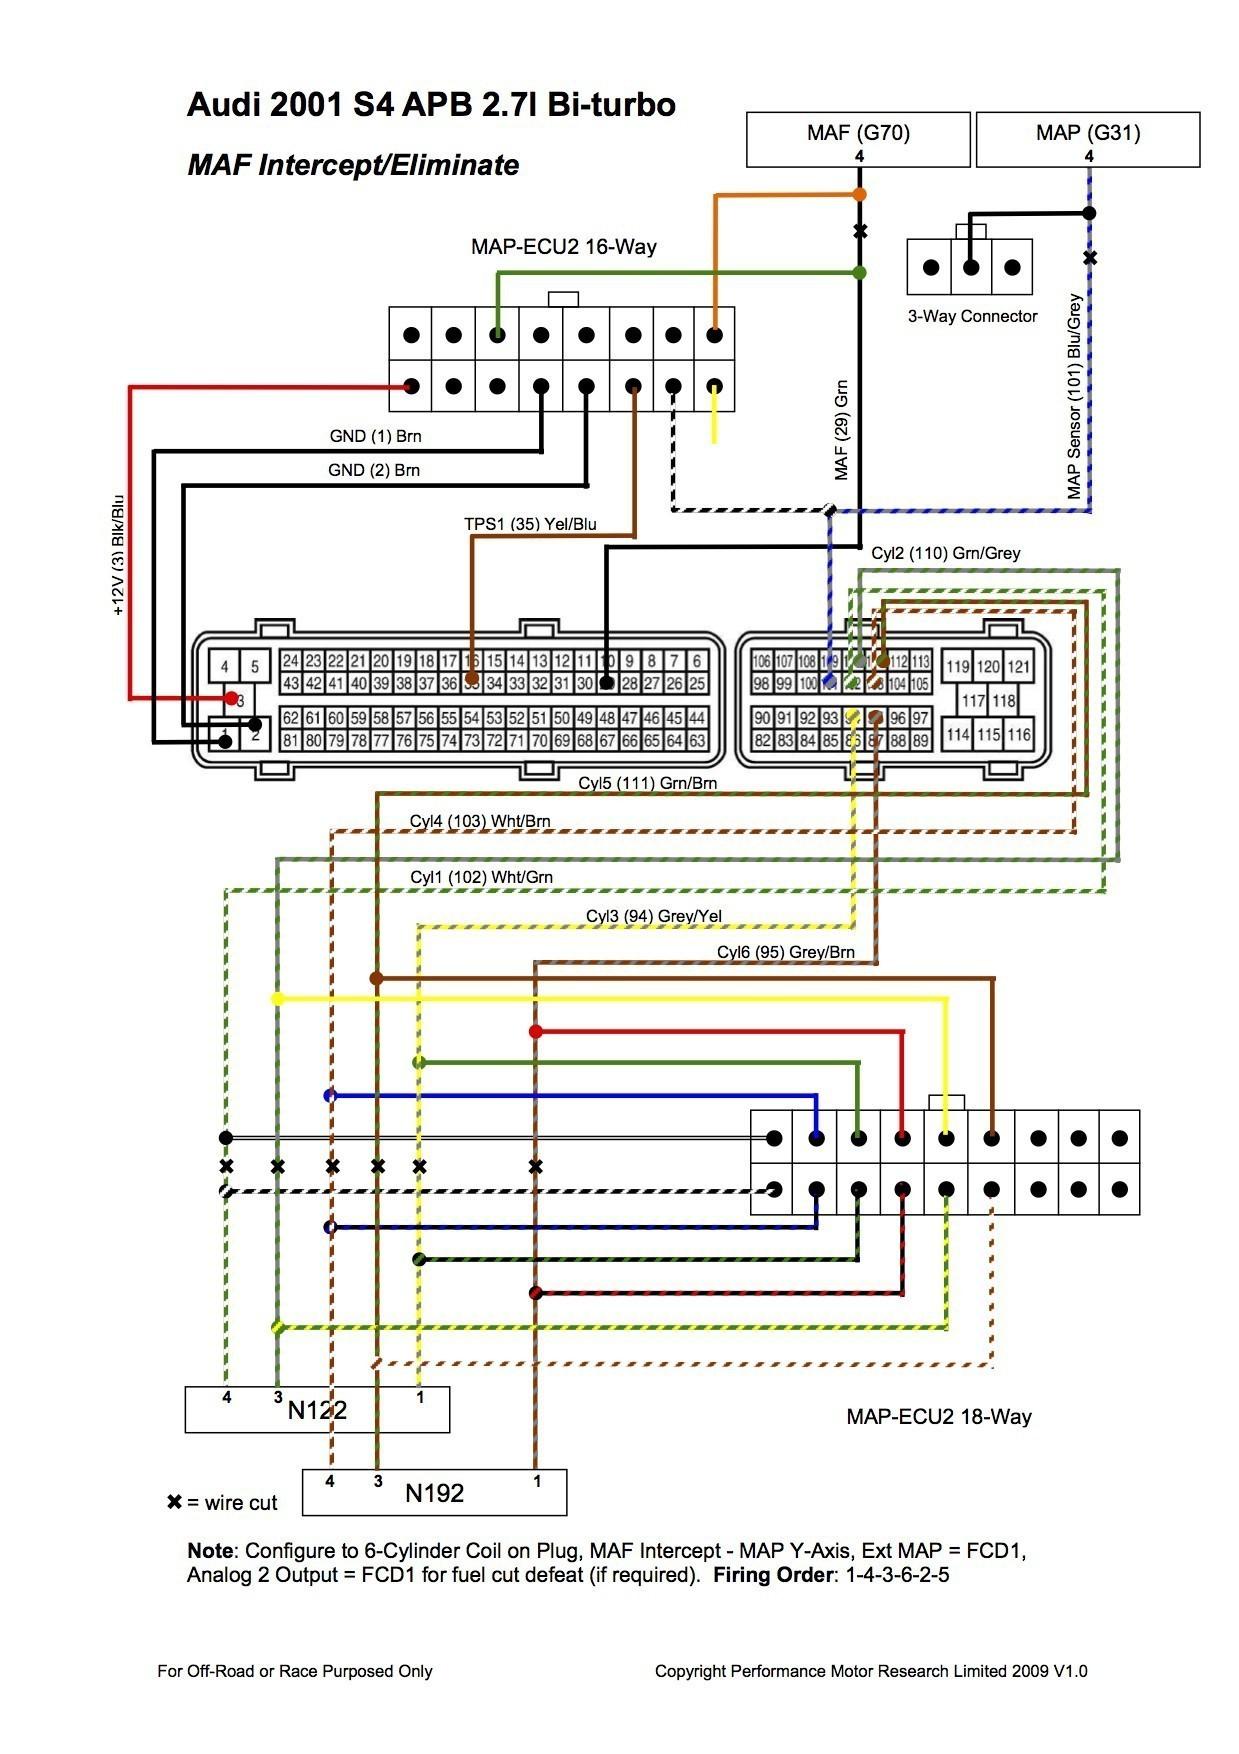 1997 Dodge Ram Stereo Wiring Diagram Data Fine 2007 1500 Harness On - 1999 Dodge Ram 1500 Radio Wiring Diagram